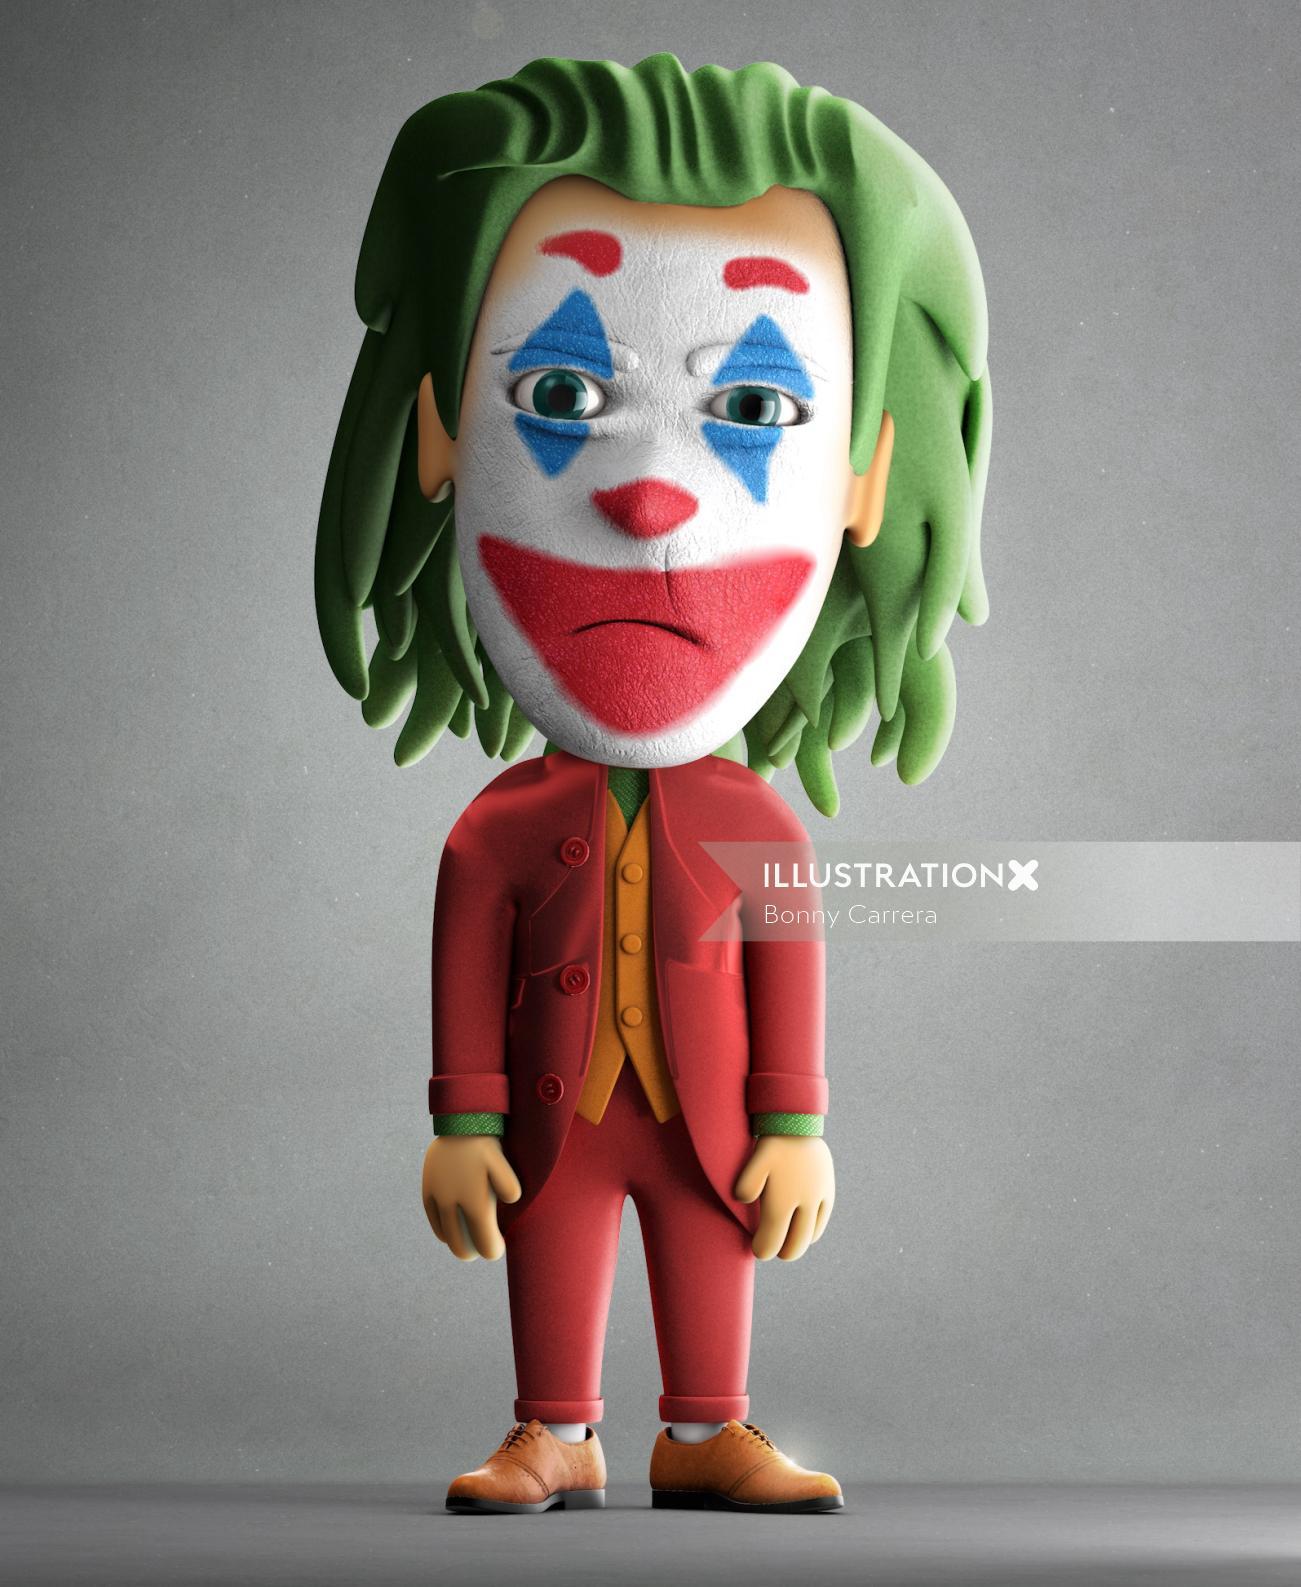 Cartoon art of joker